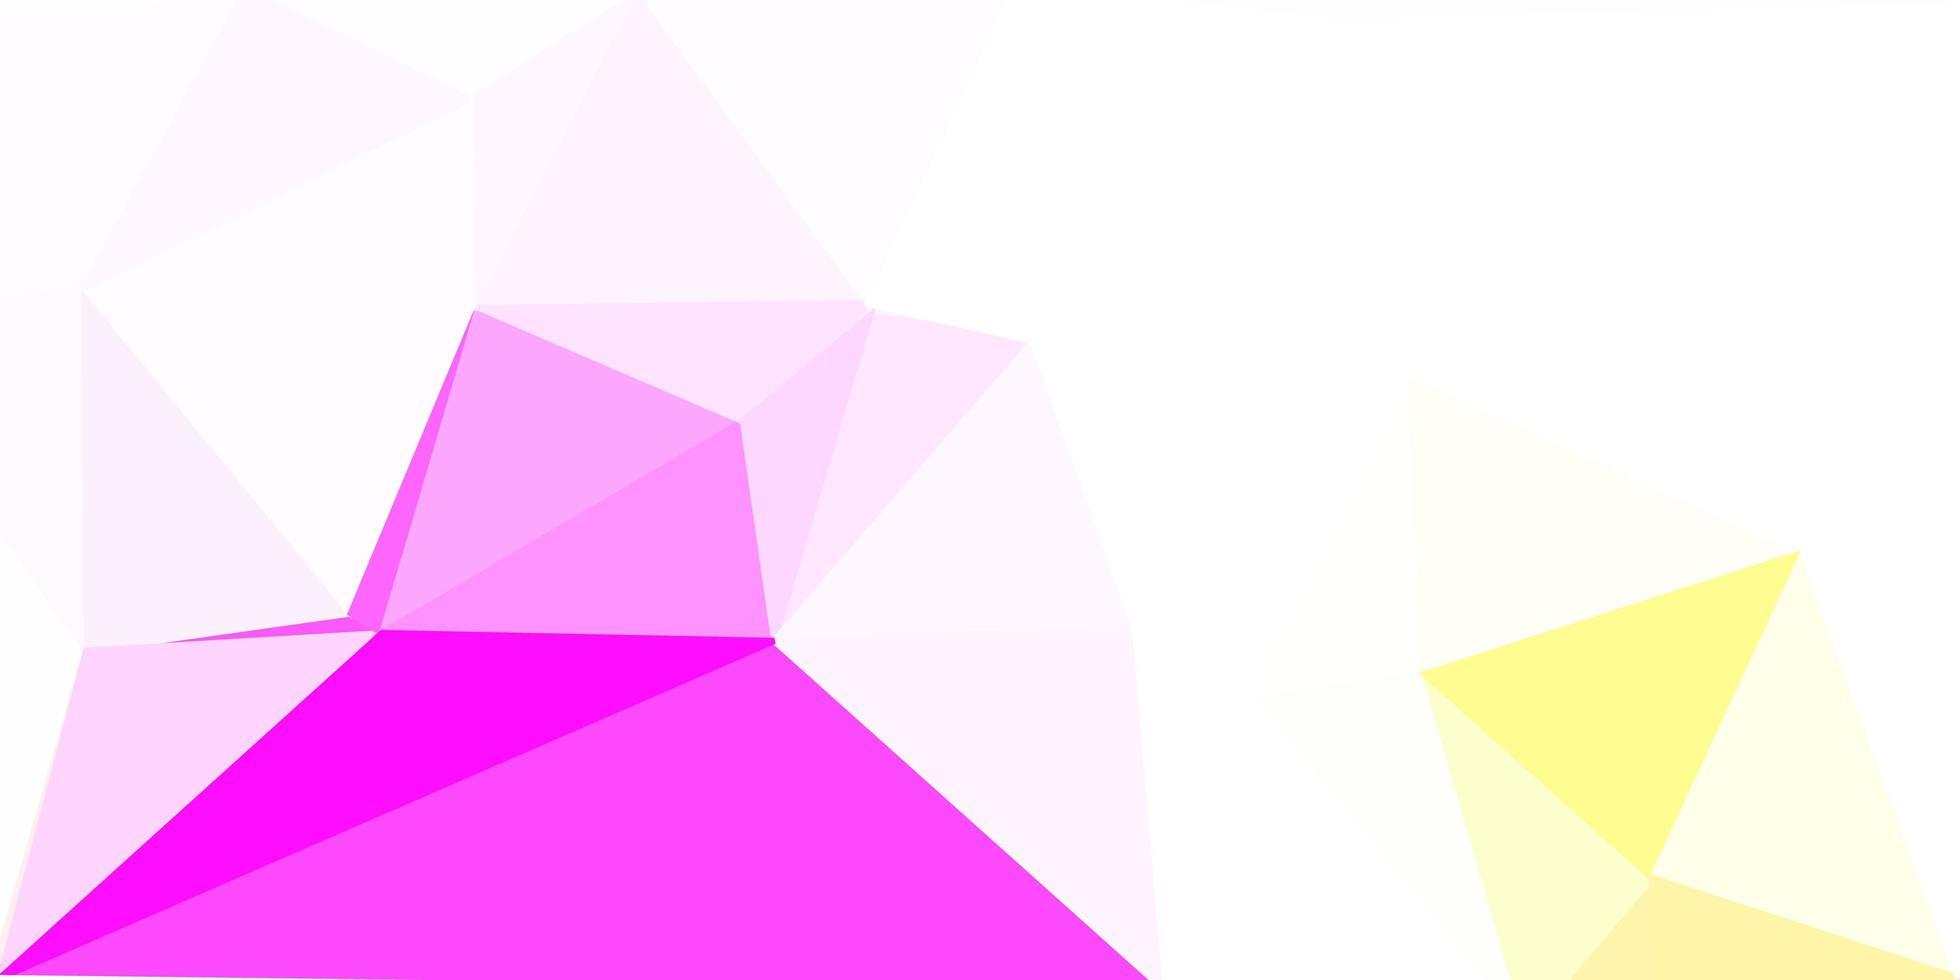 ljusrosa, gul vektor geometrisk polygonal design.